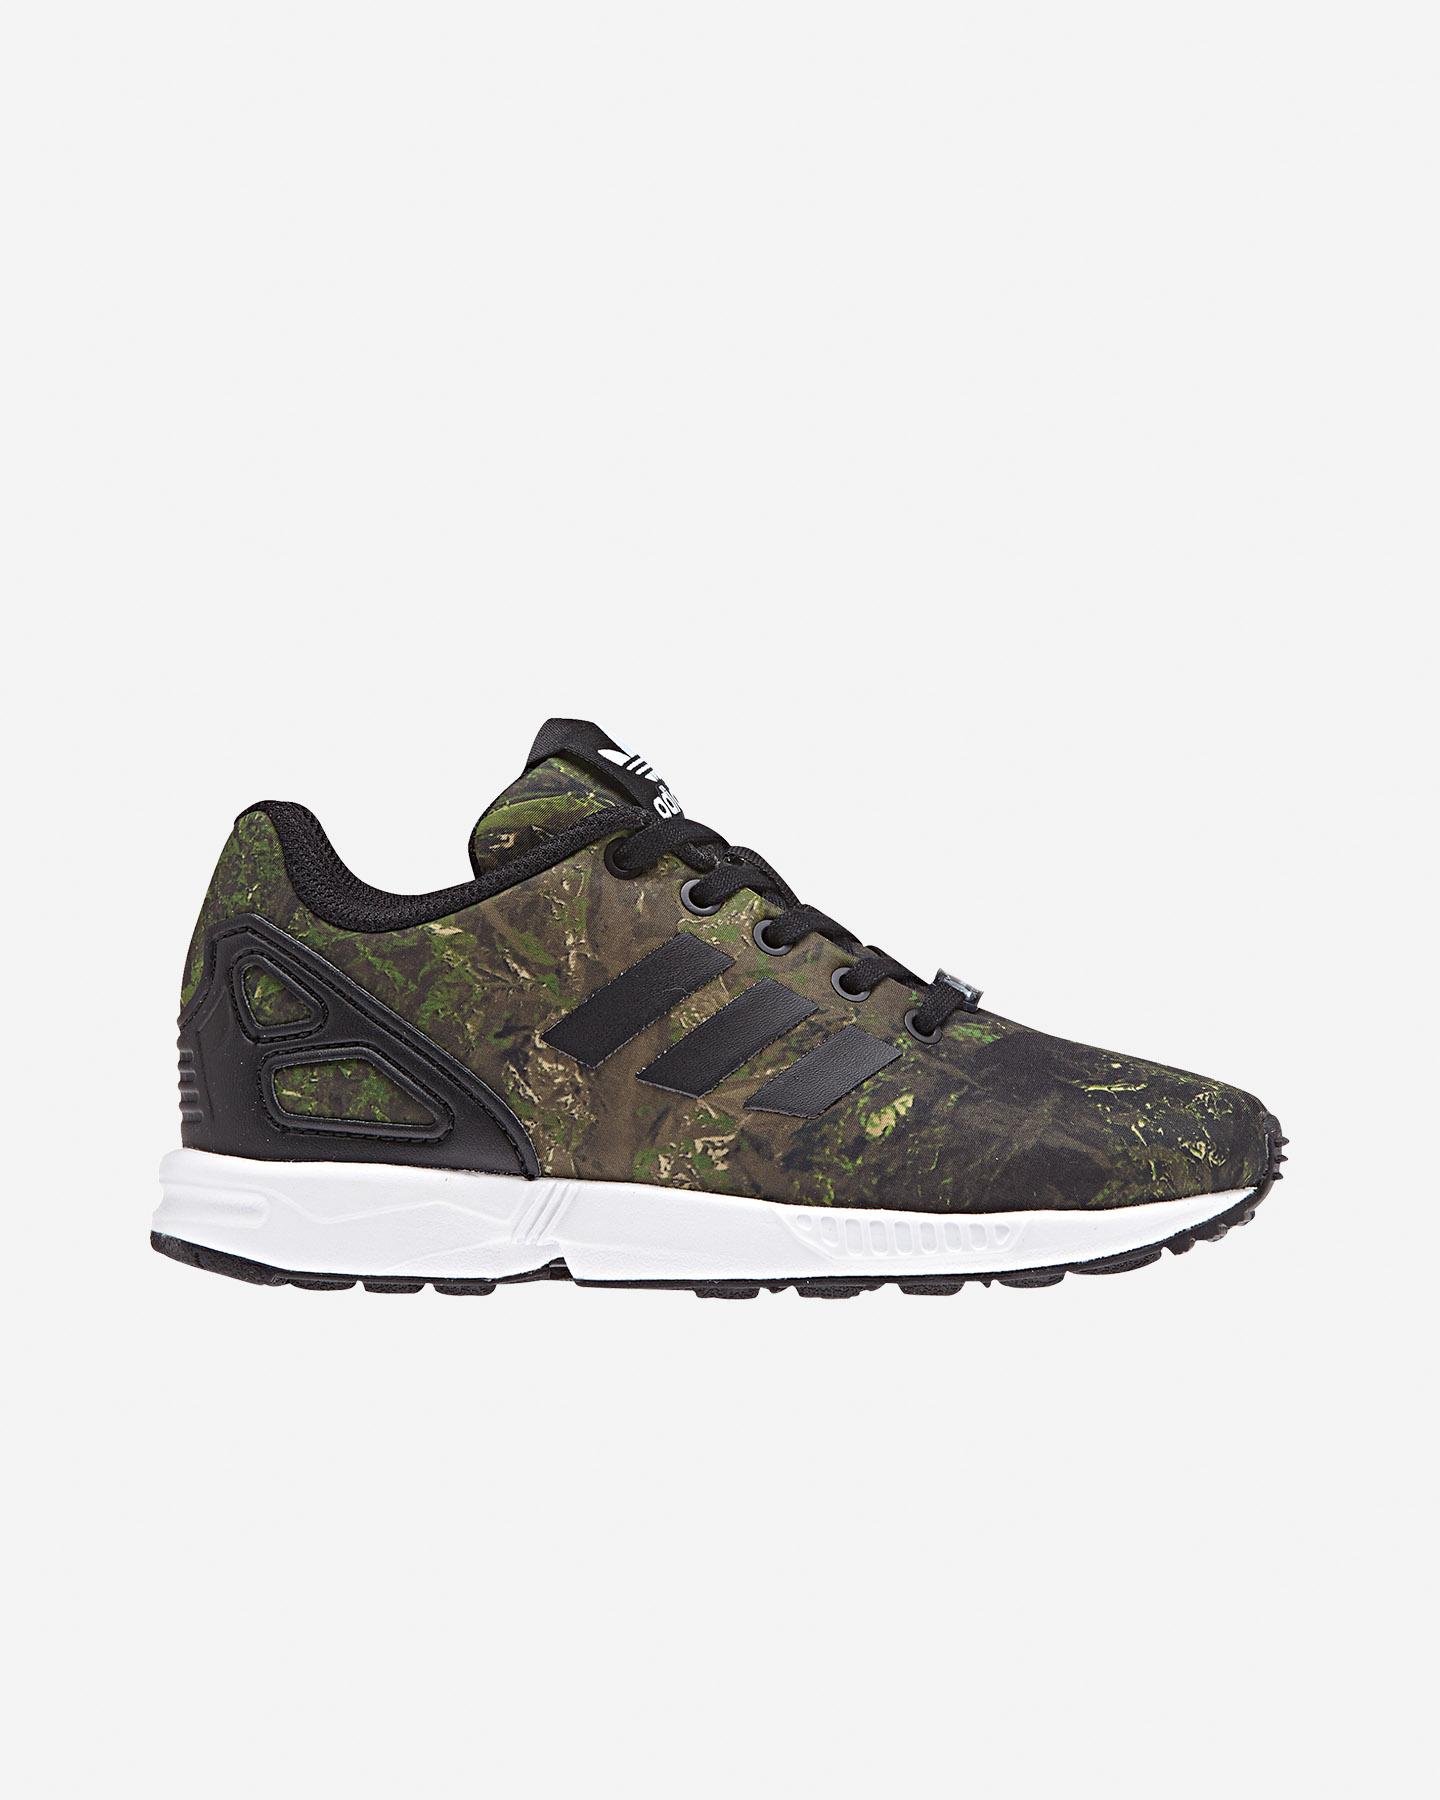 scarpe da ginnastica adidas torsion